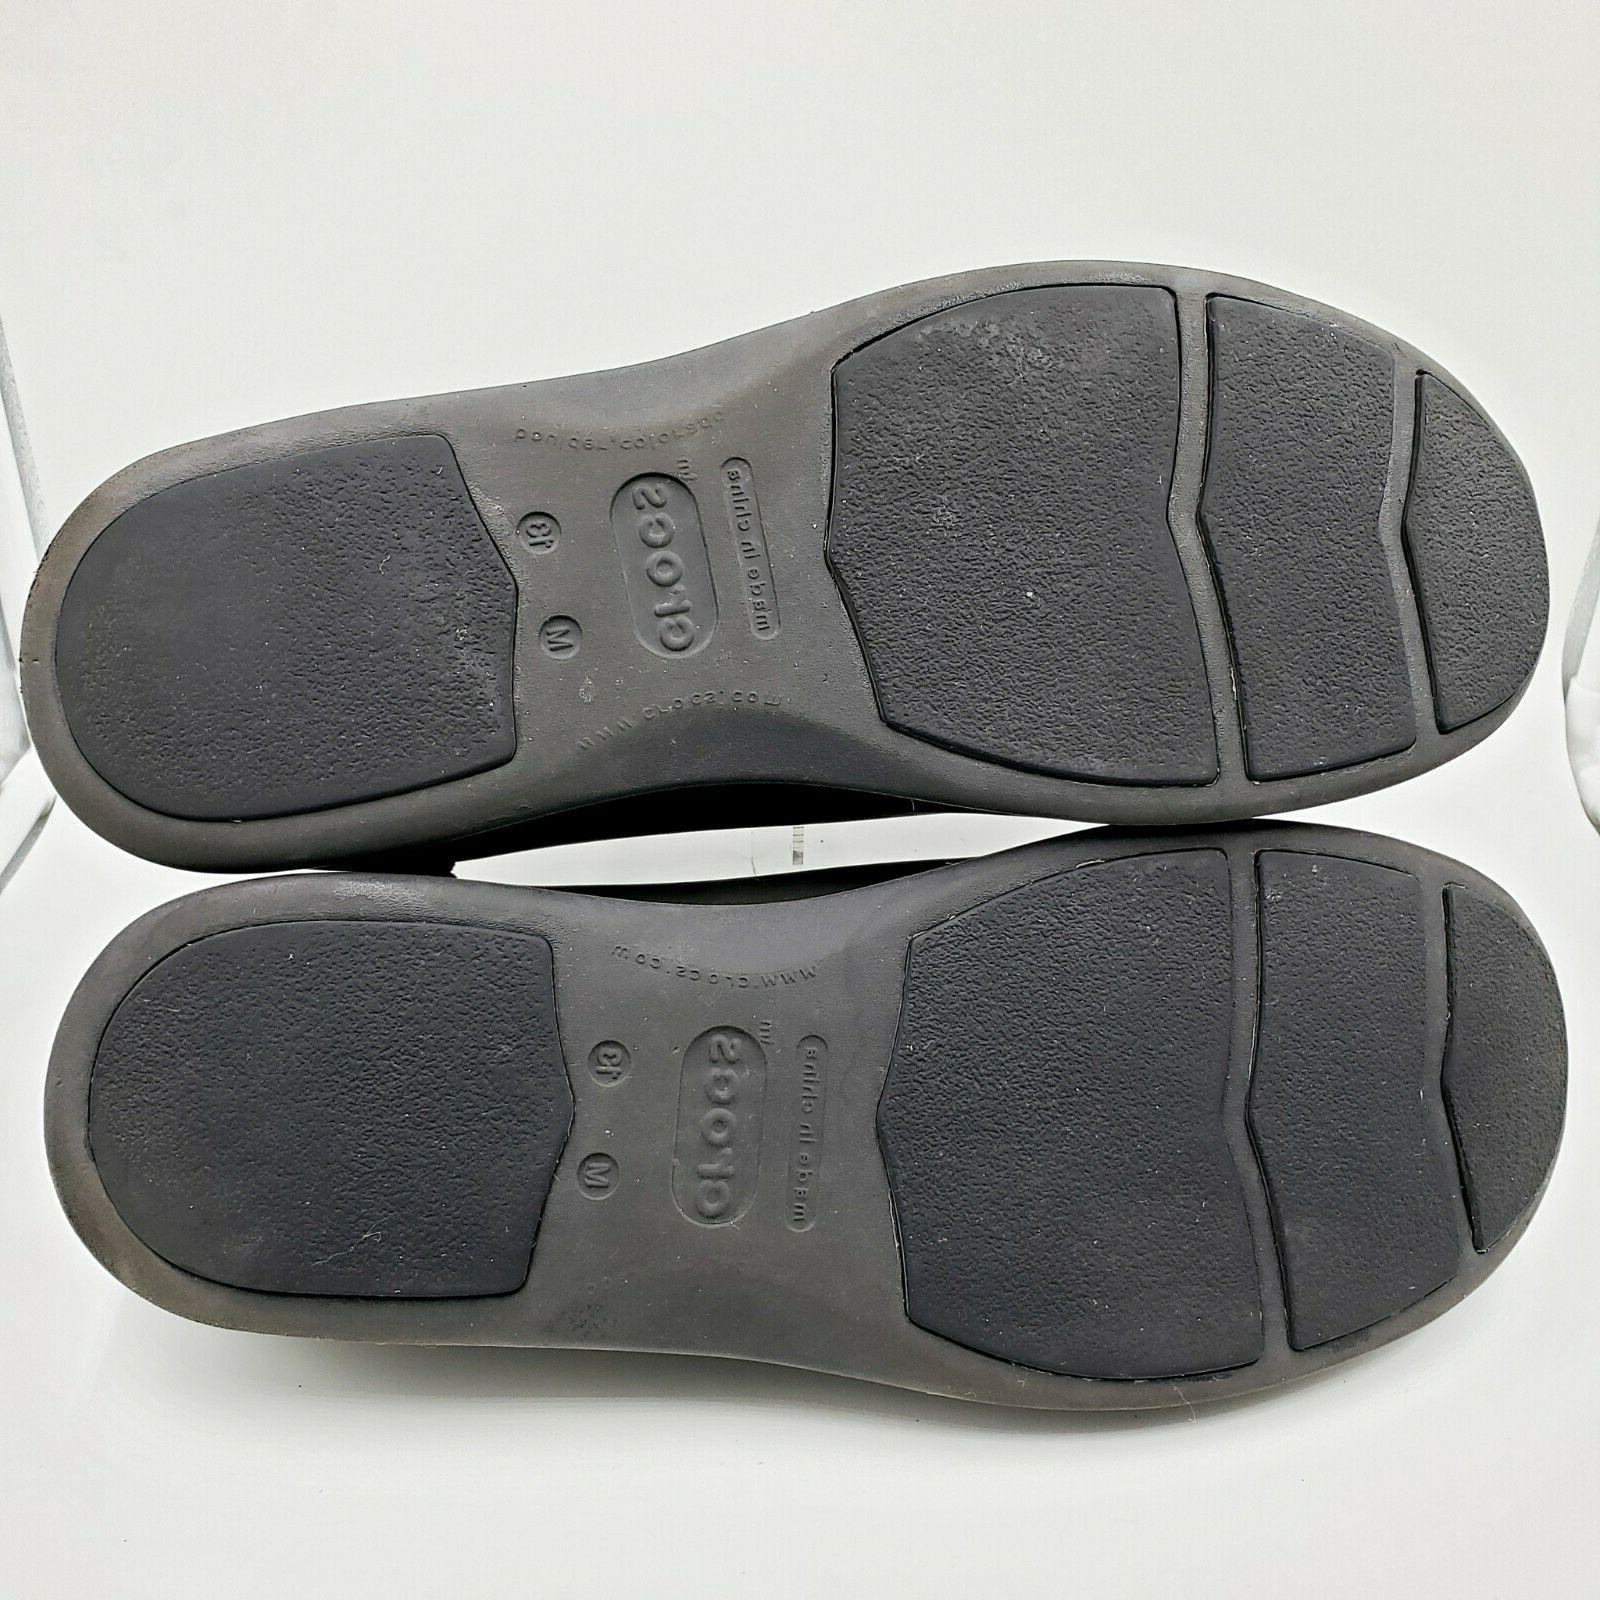 Crocs Venture Leather Casual Sneaker Men's